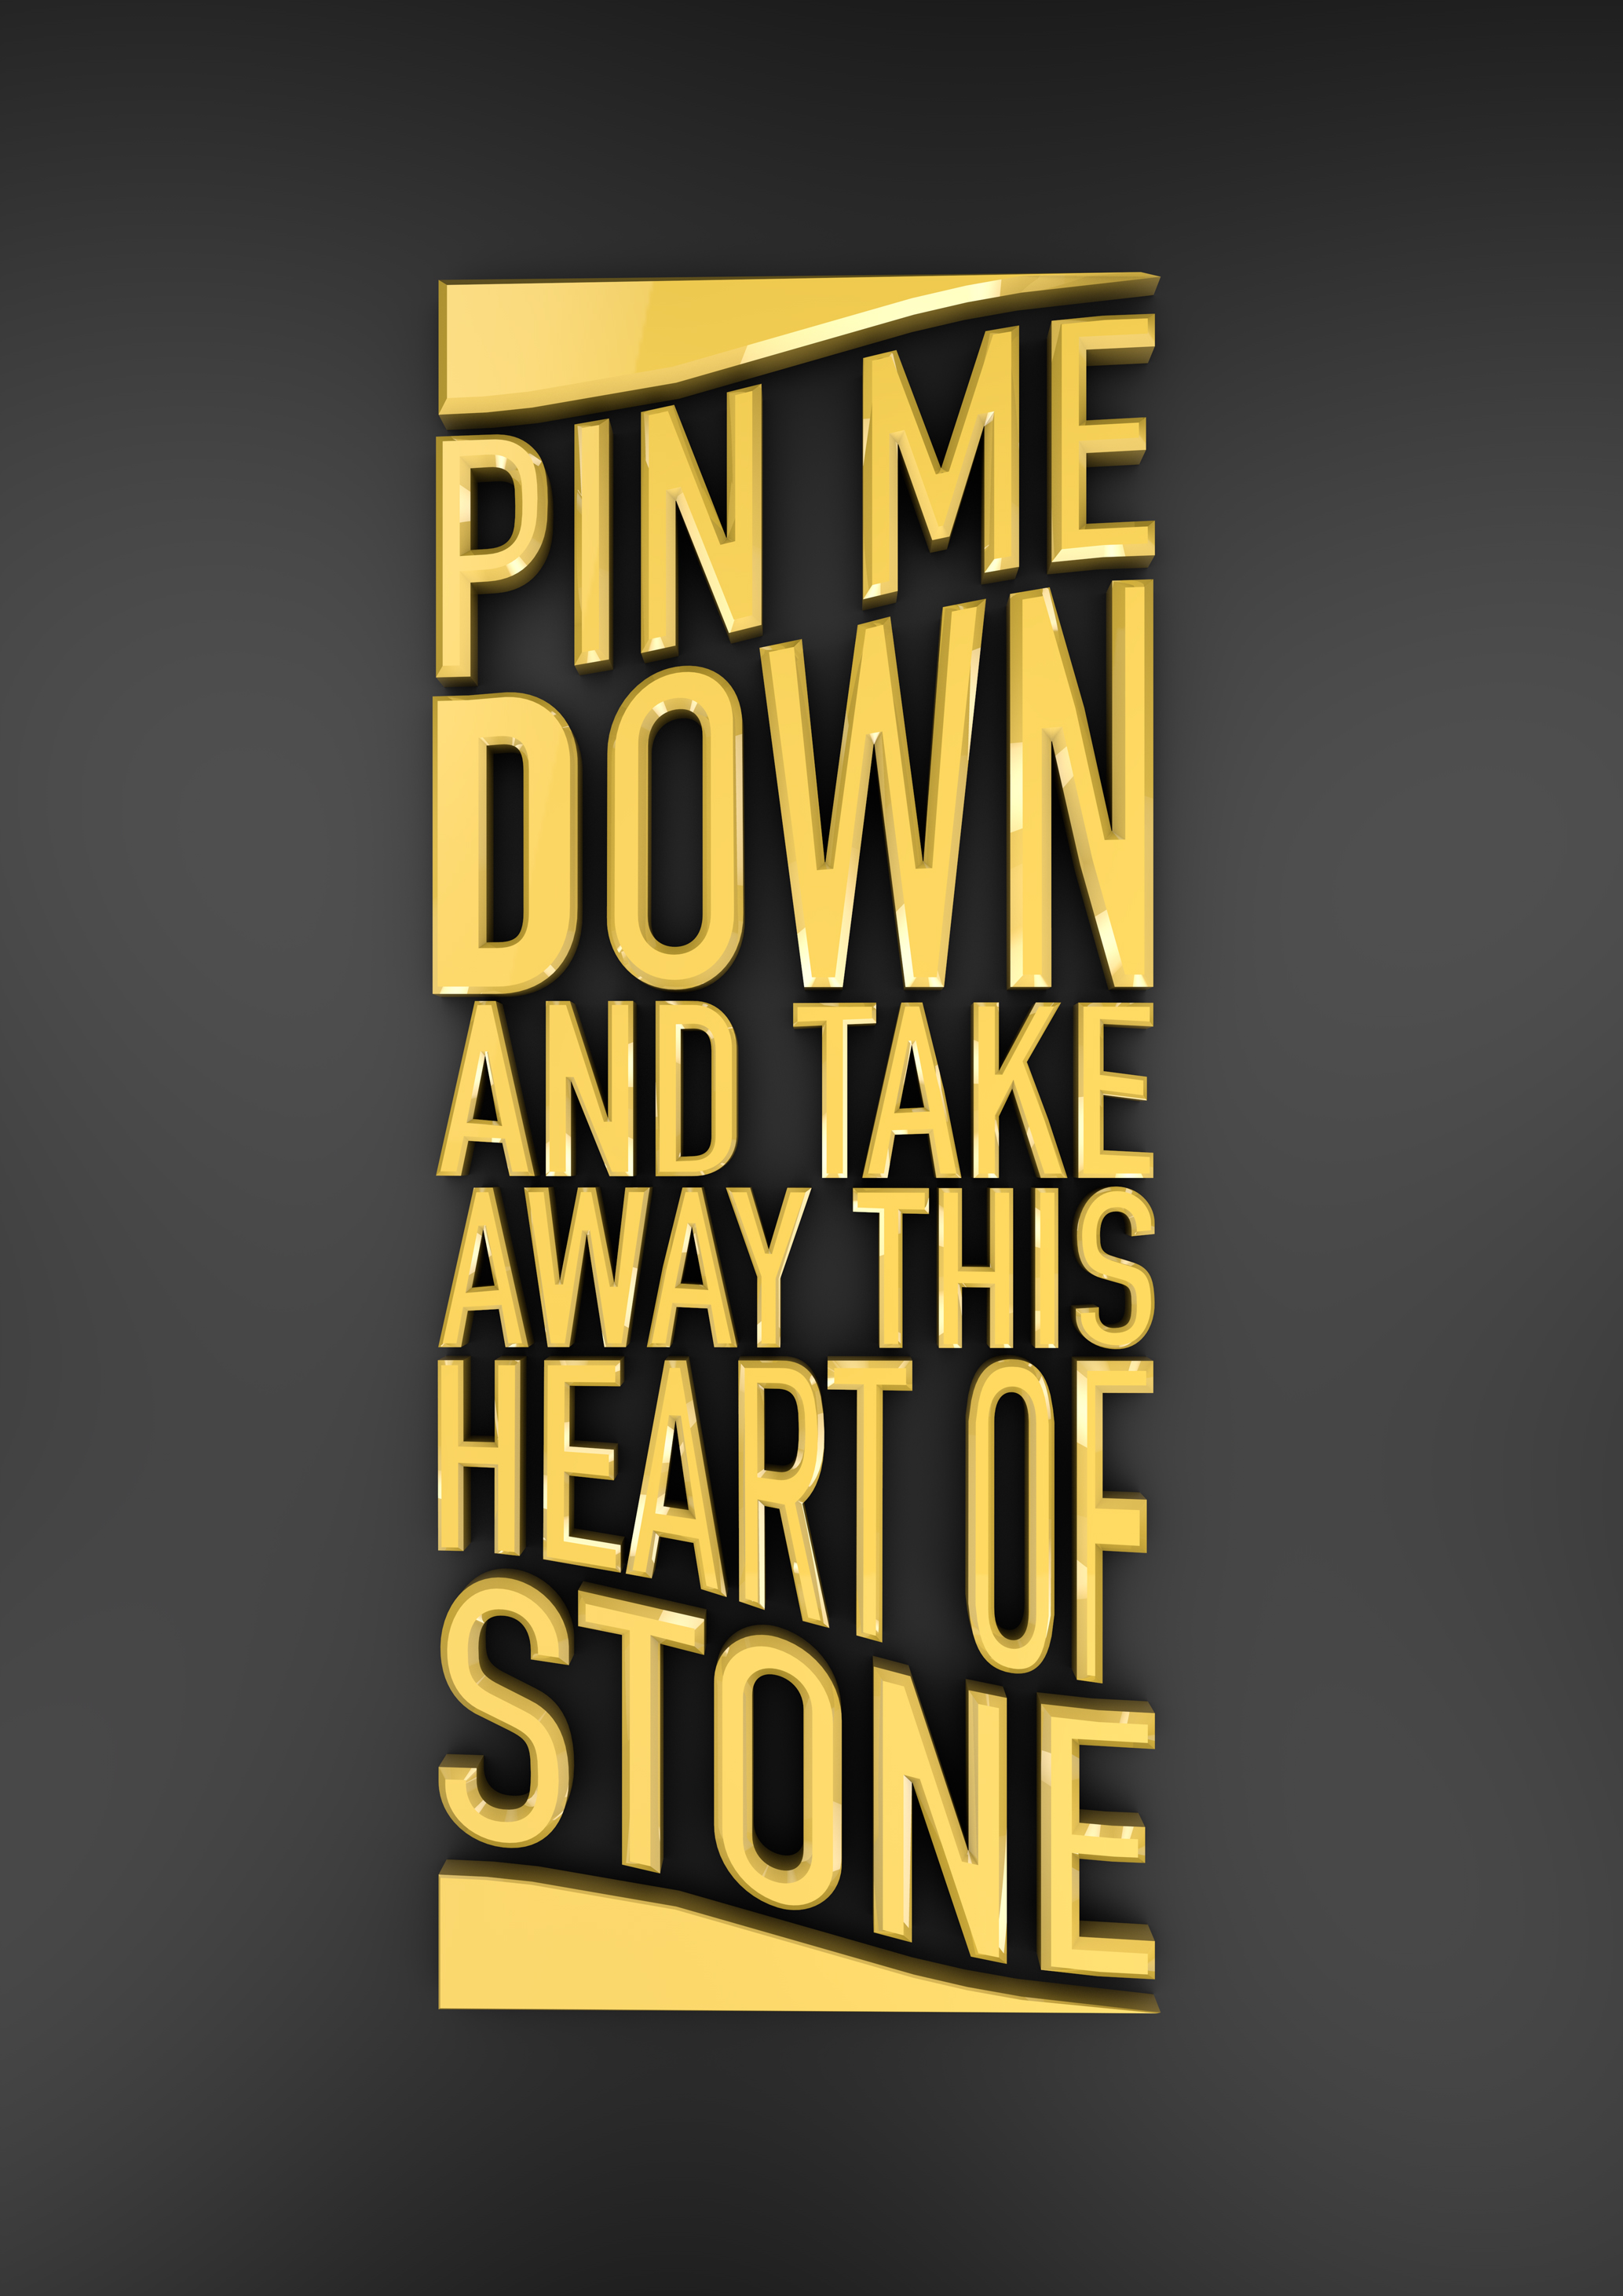 Heart-of-Stone2.jpg